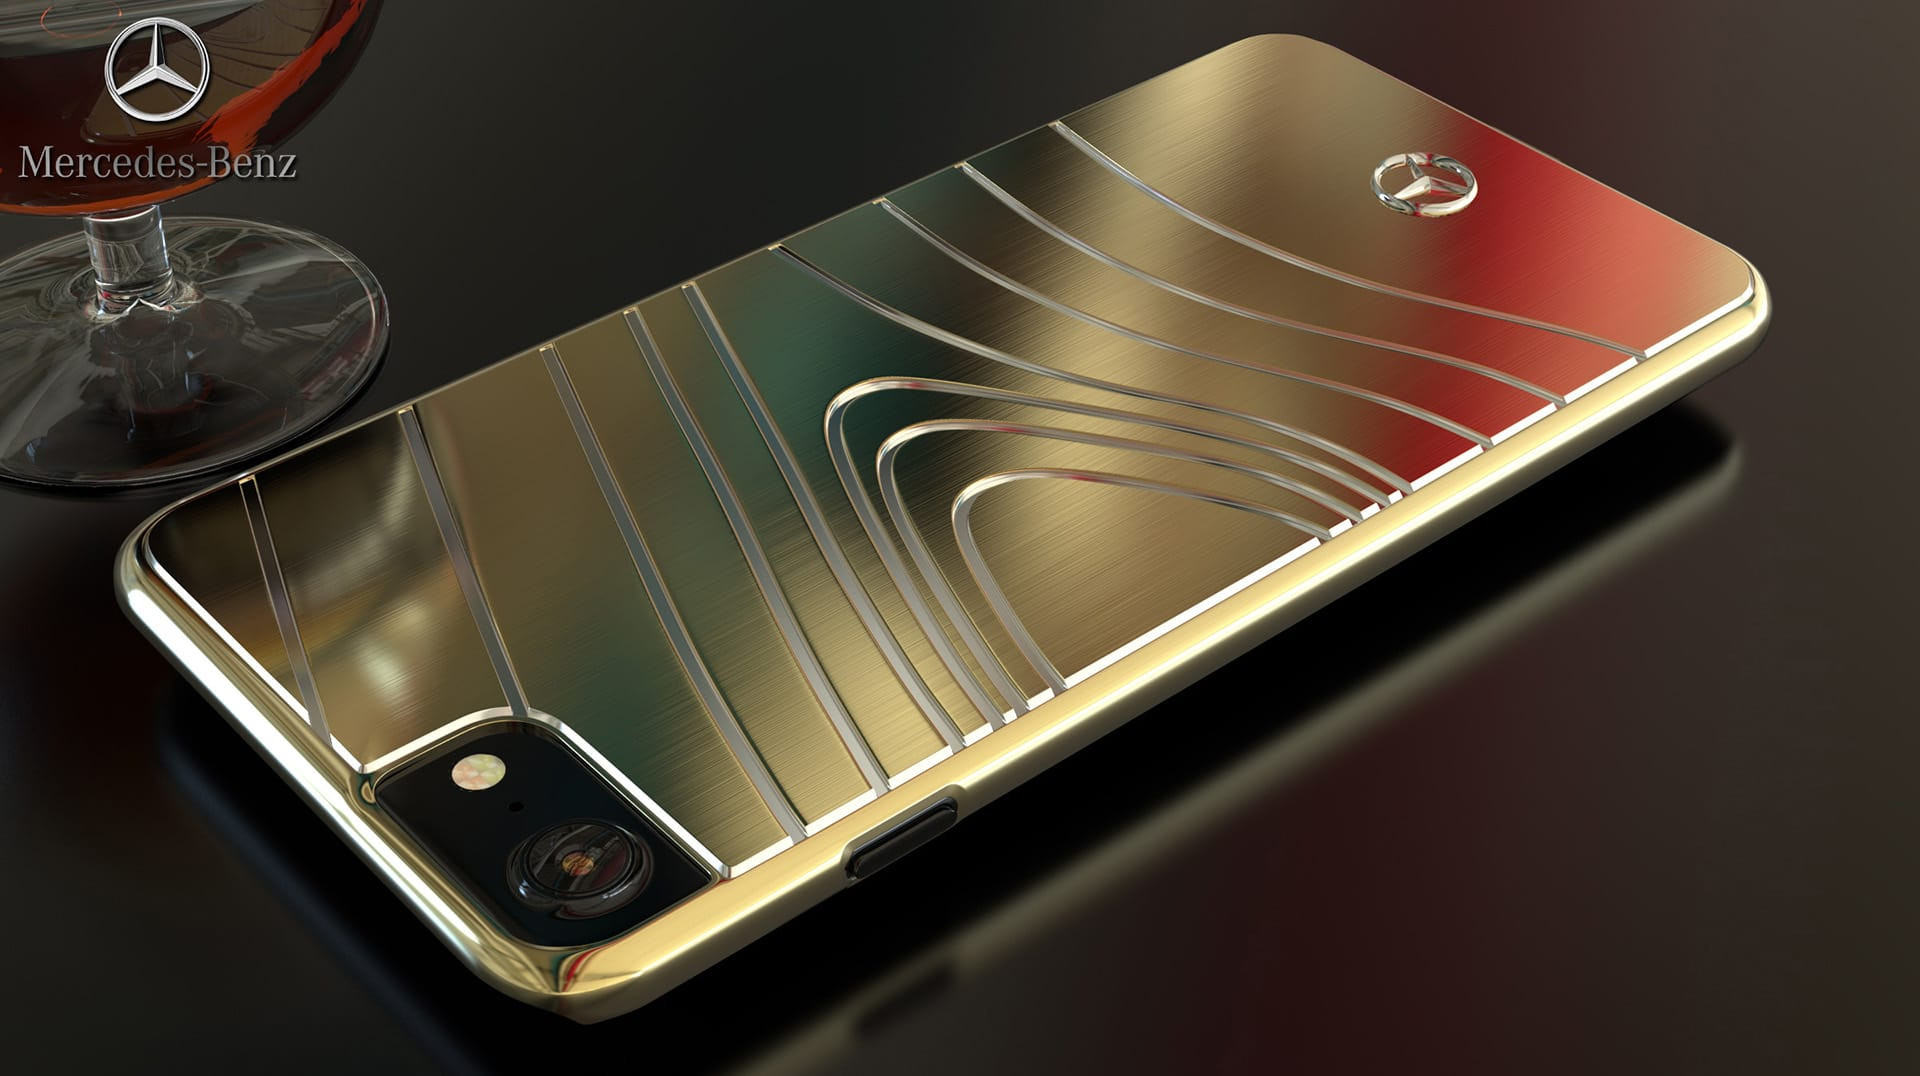 mercedes benz apple iphone 7 plus 8 plus sls amg. Black Bedroom Furniture Sets. Home Design Ideas